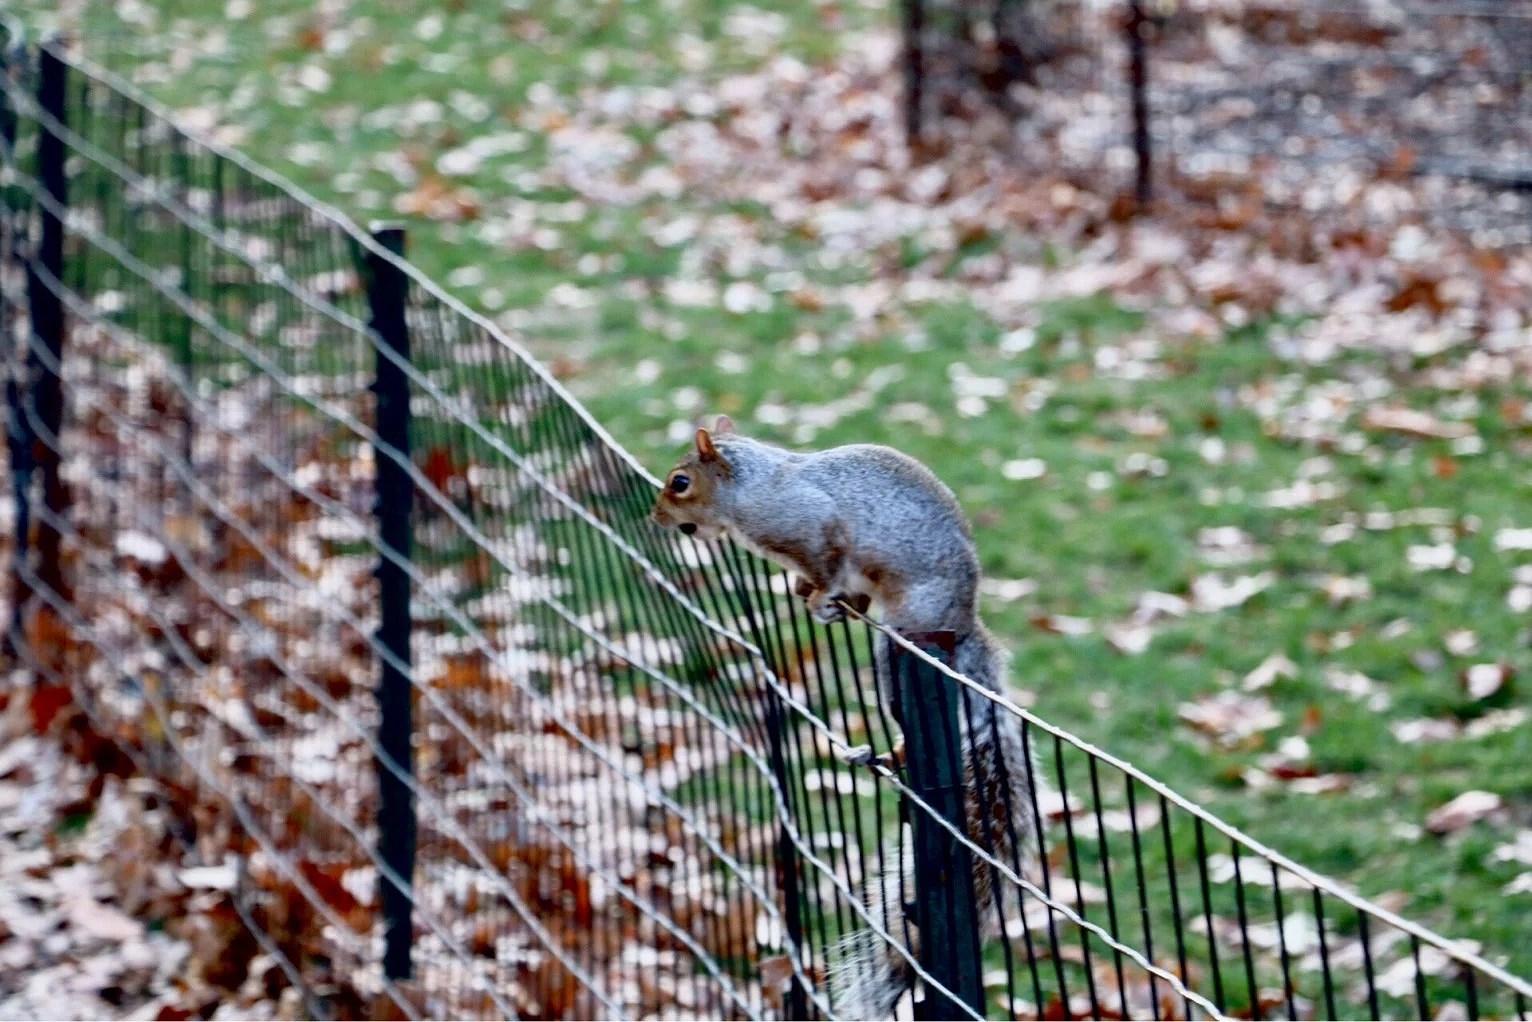 Ekorrar i Central Park